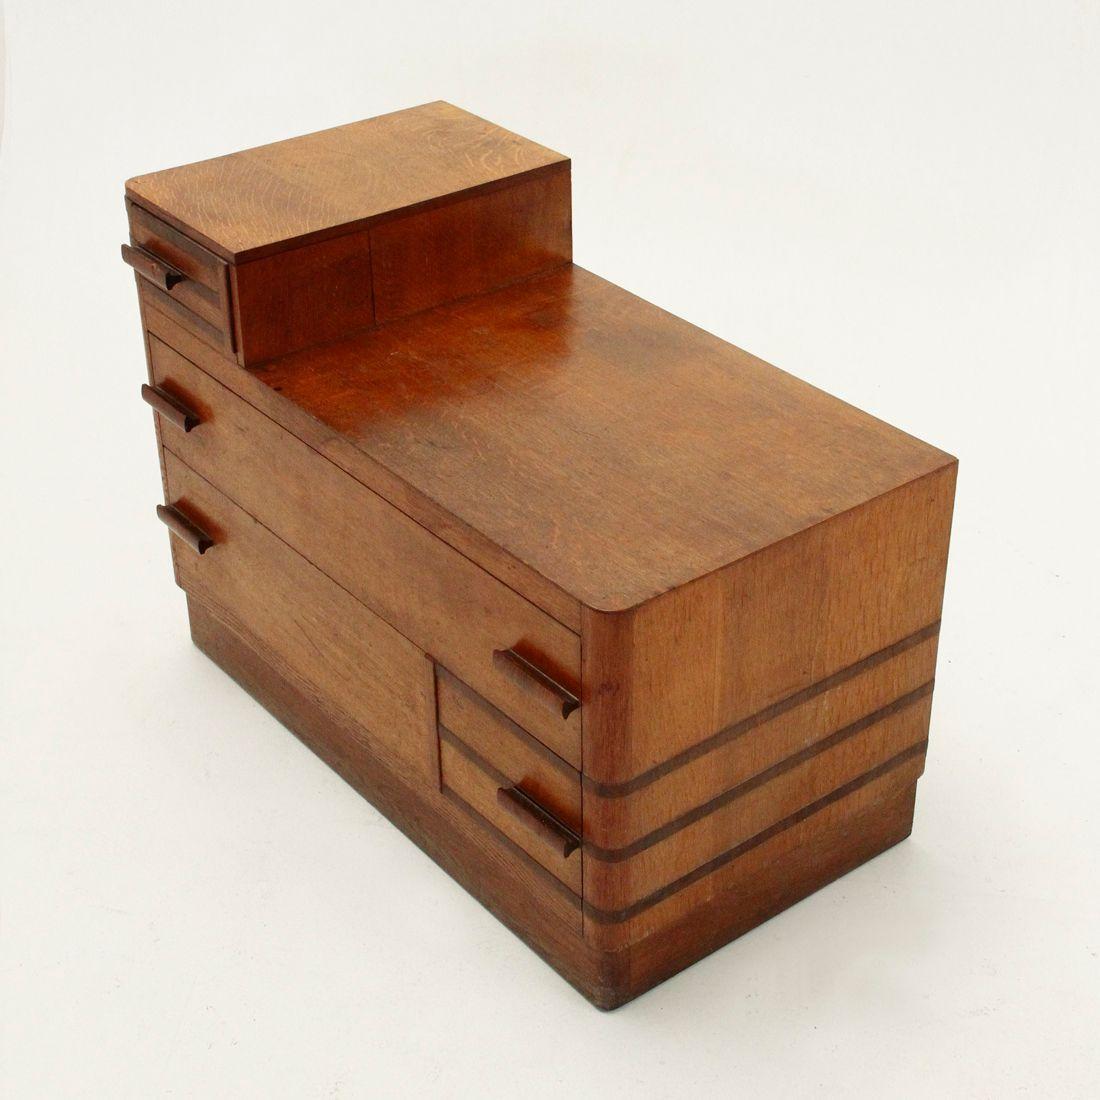 italienische rationalistische kommode 1940er bei pamono. Black Bedroom Furniture Sets. Home Design Ideas